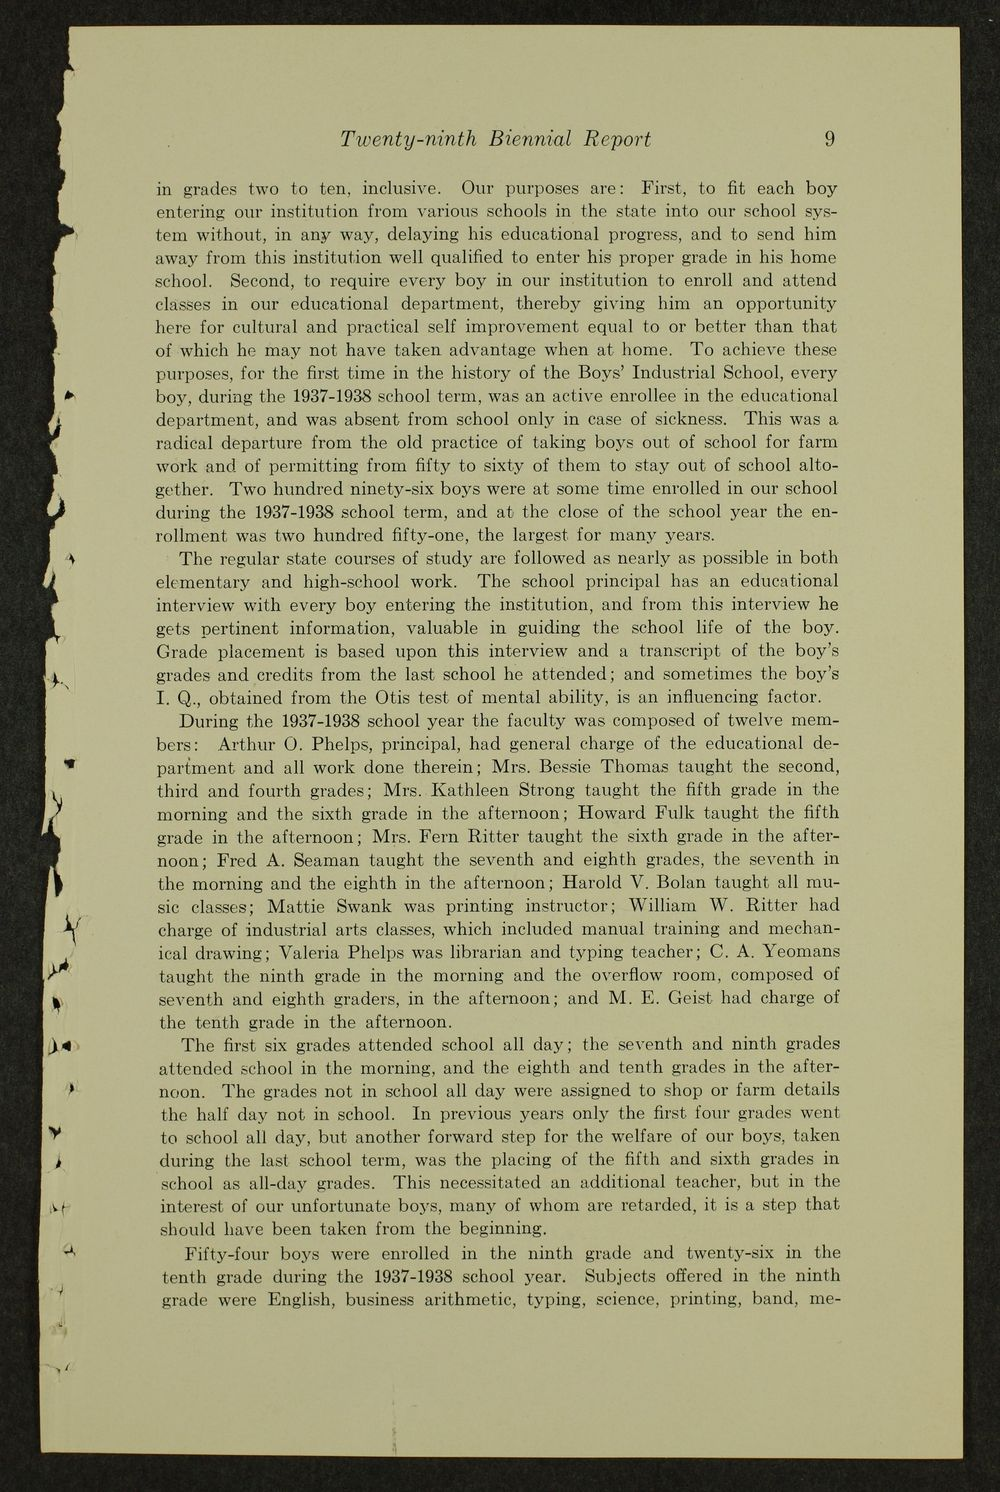 Biennial report of the Boys Industrial School, 1938 - 9